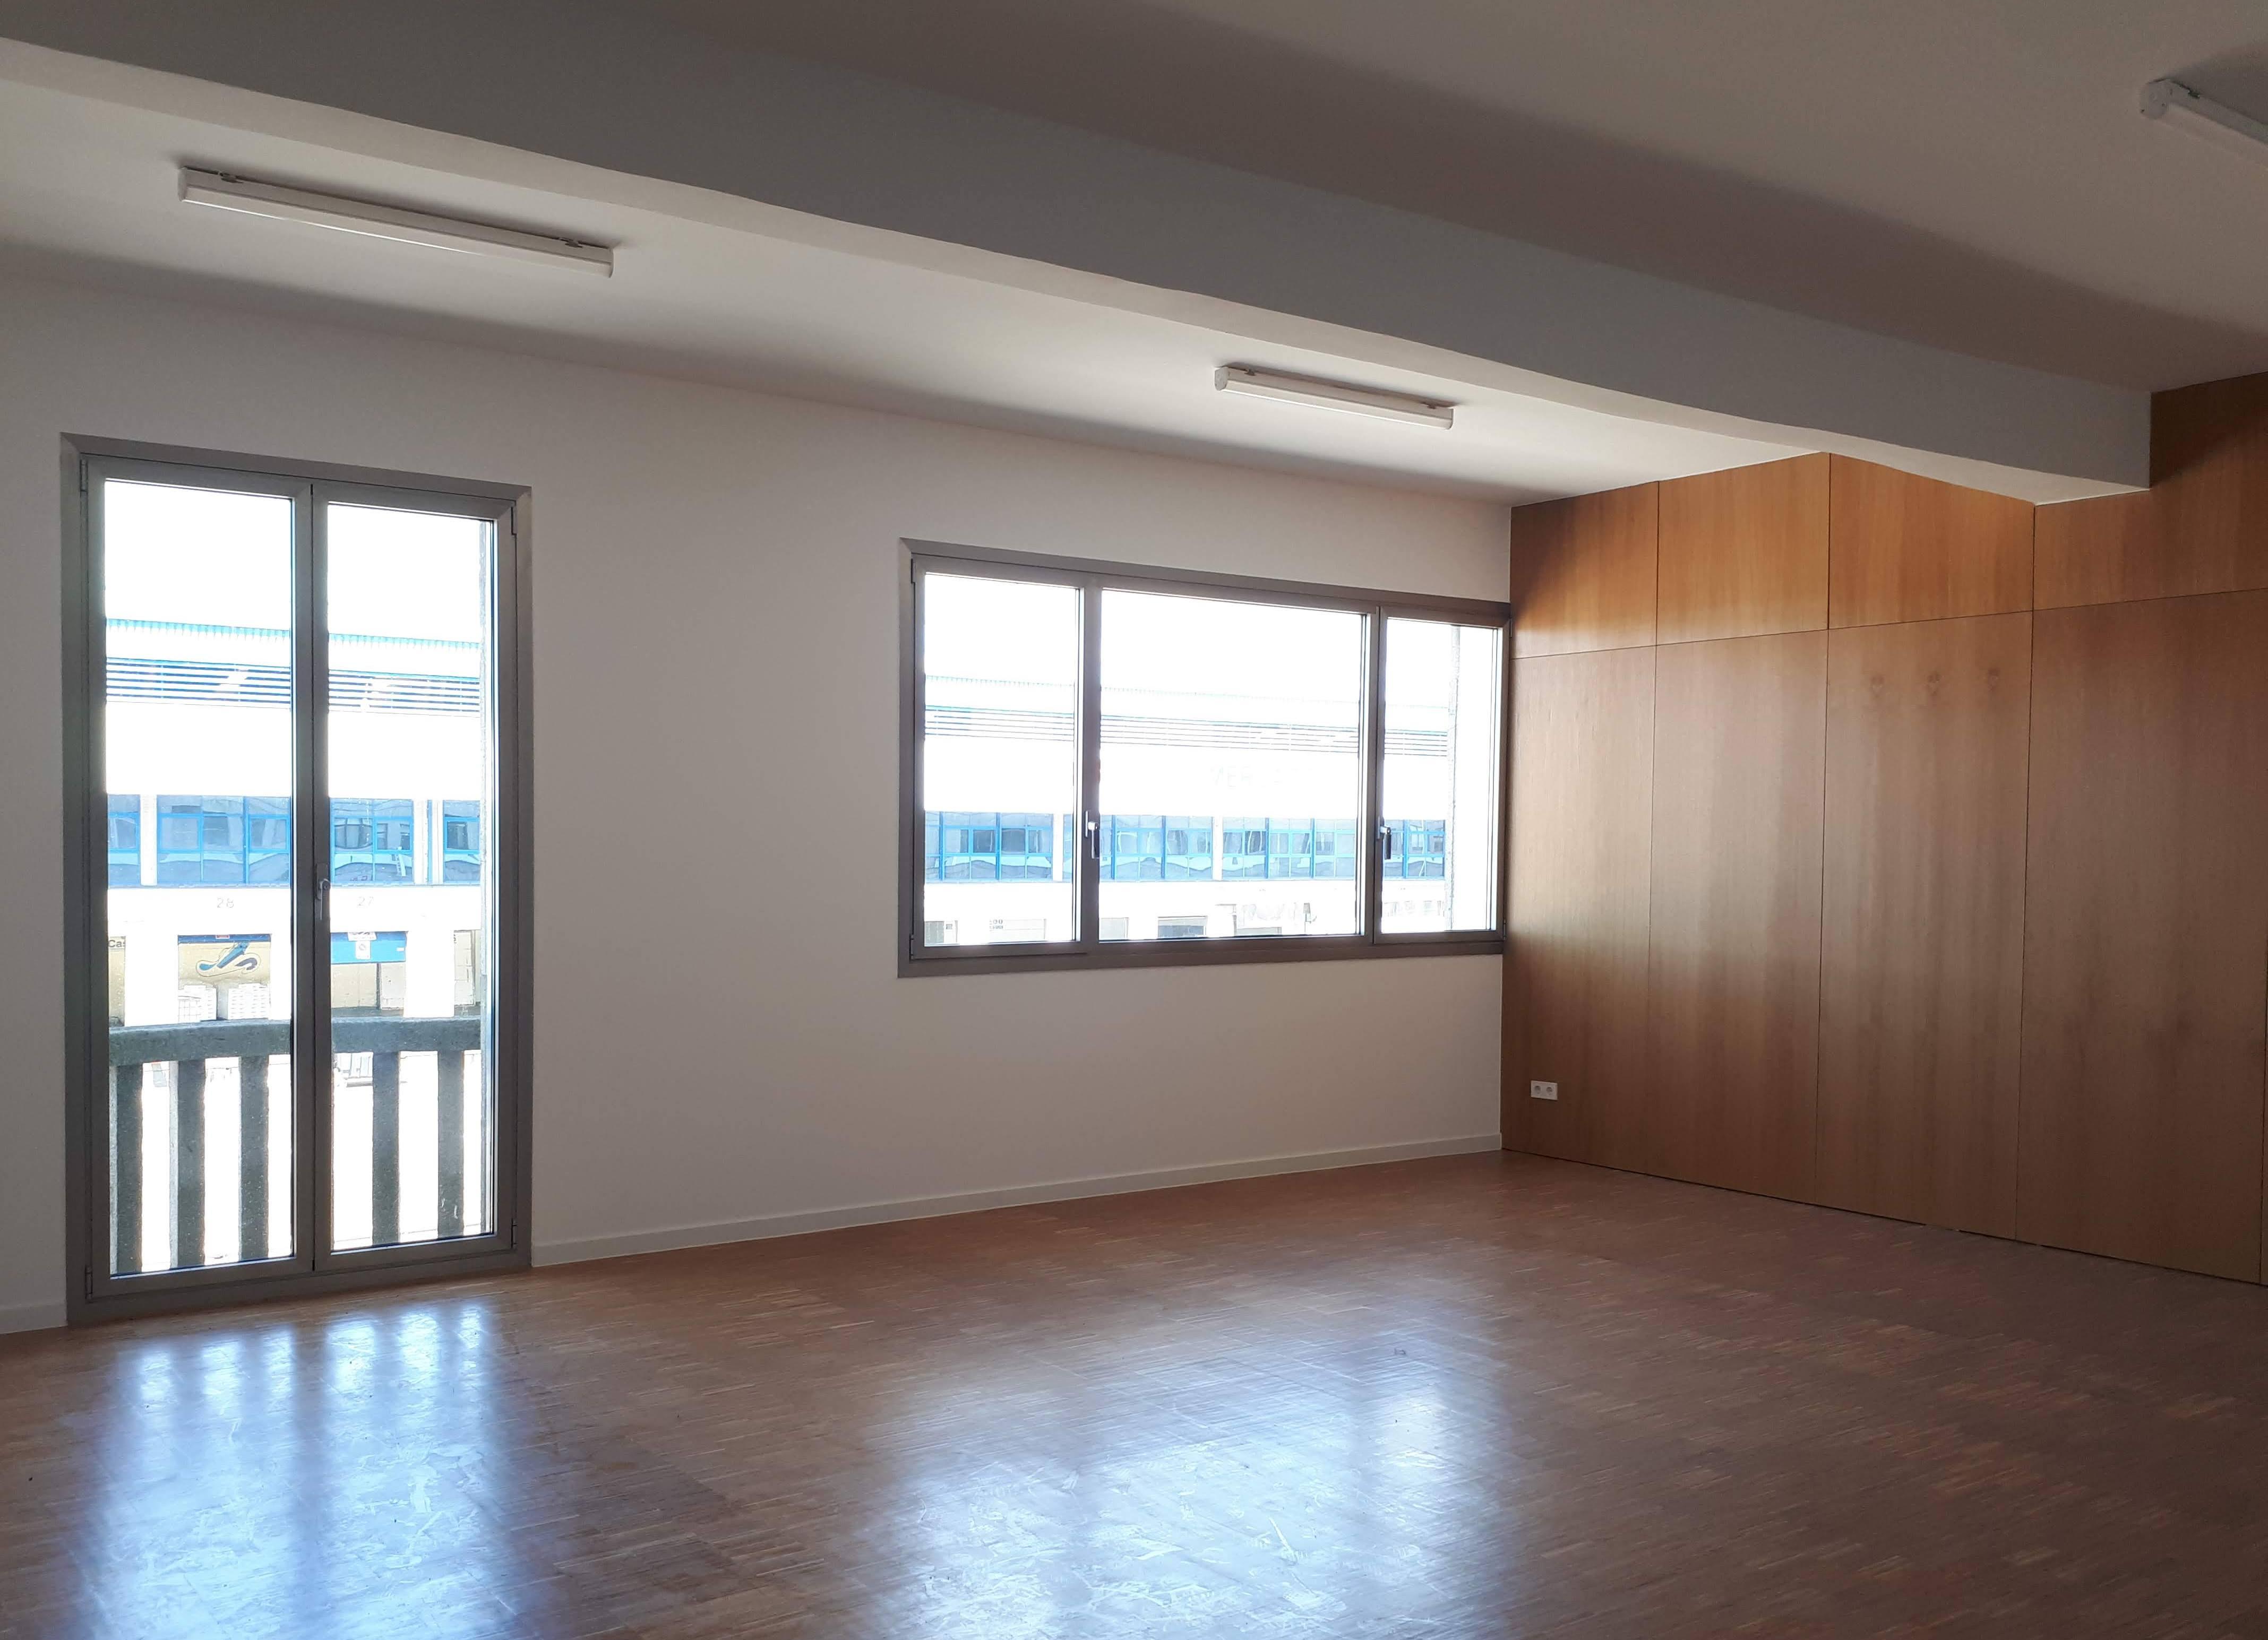 Soportales del Berbés: Office Spaces Available